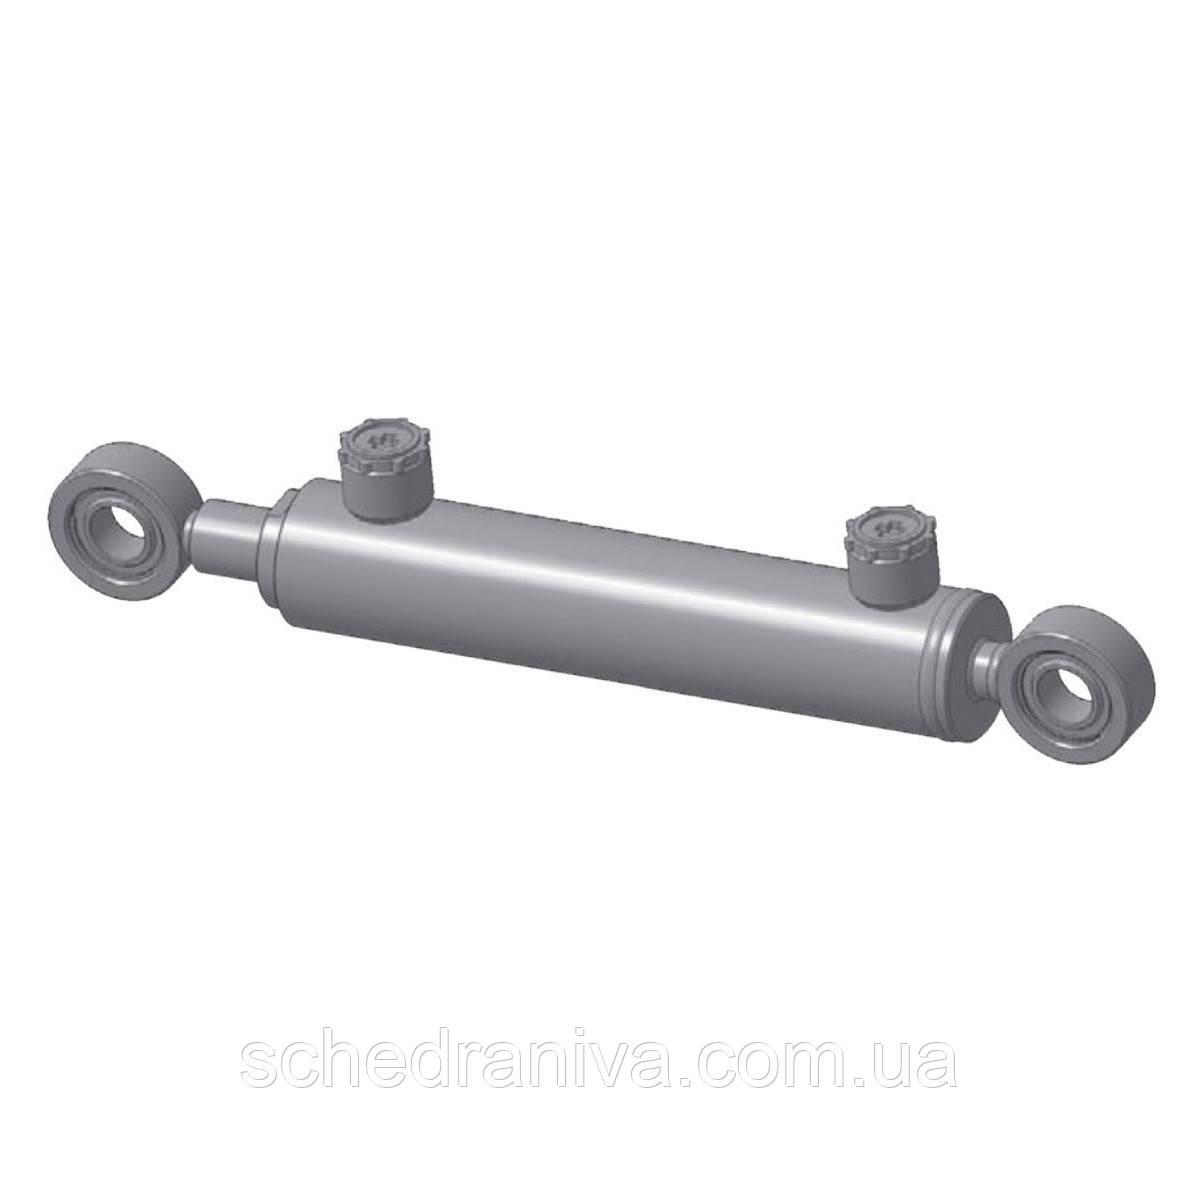 Гидроцилиндр свеклопогрузчика СПС-4,2 МС 40/25х250-3.11 (440) п-во Гидросила